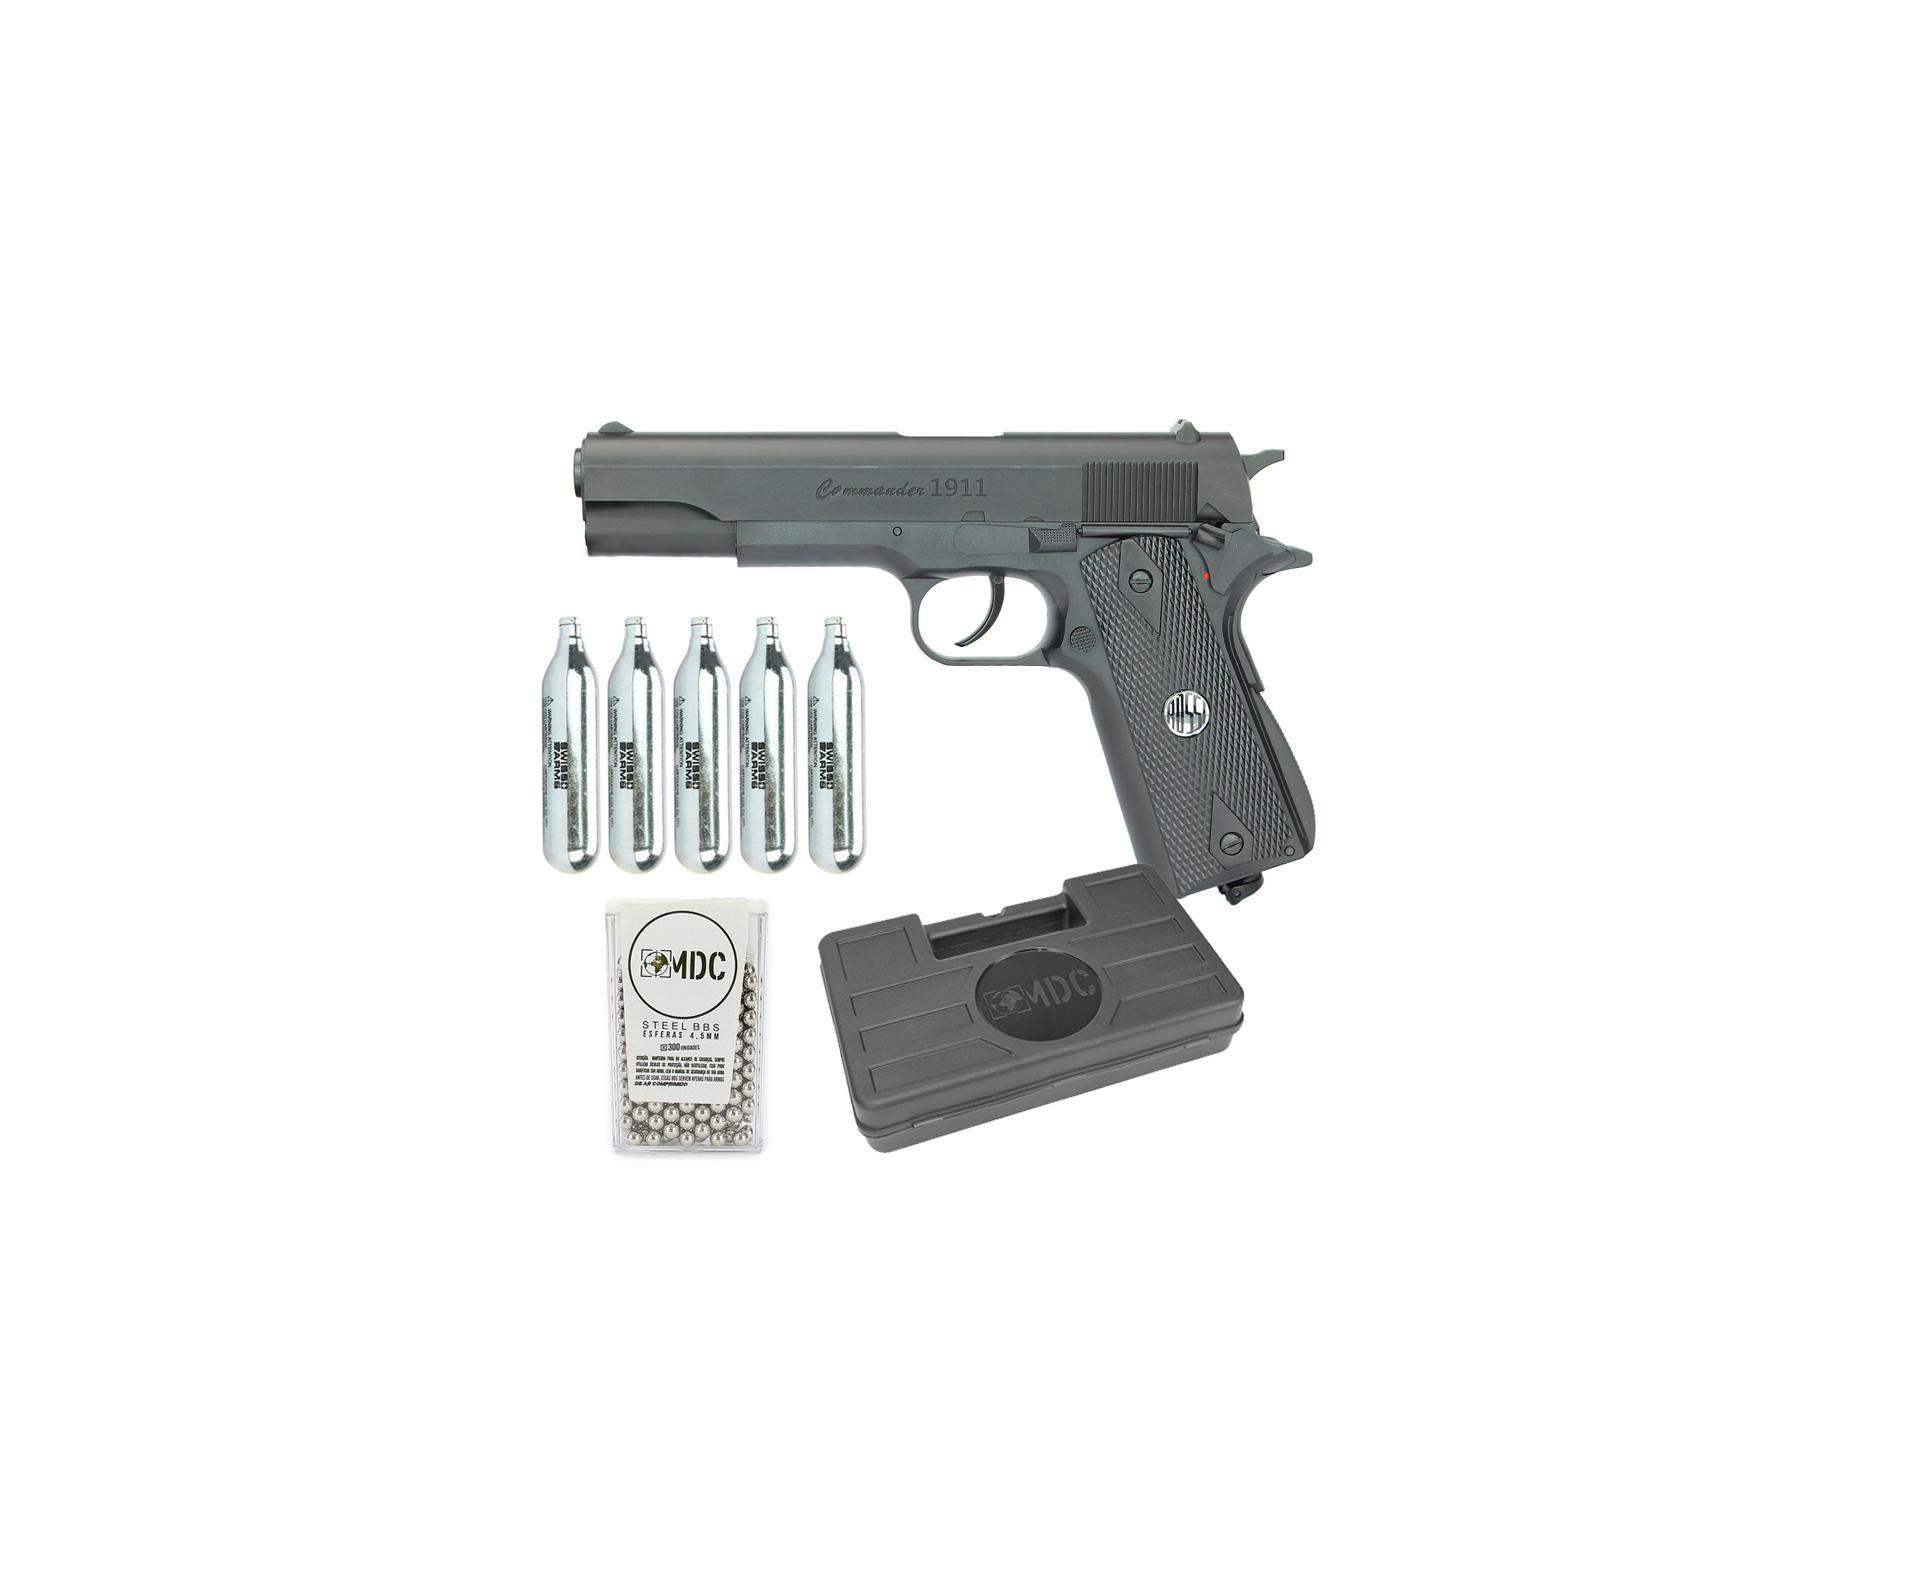 Pistola De Pressão Commander 1911 W125b Co2 Cal 4,5mm Win Gun Rossi + Case + Co2 + Munição